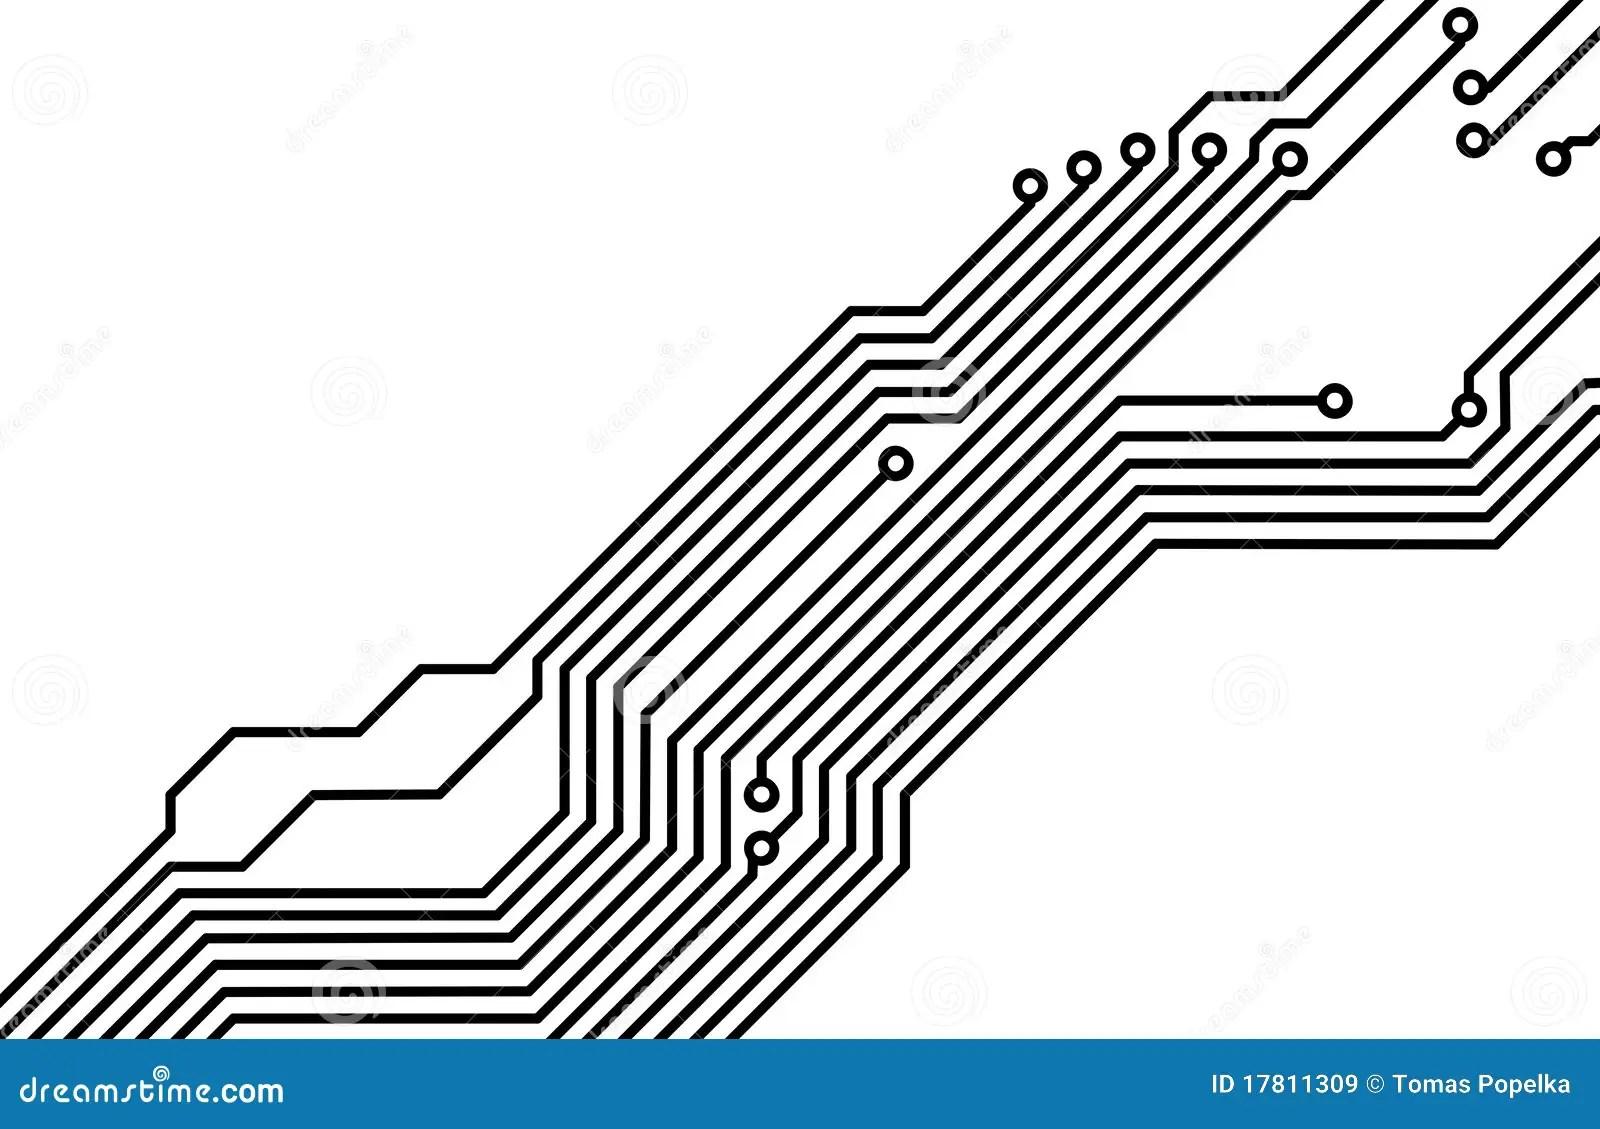 Pcb Printed Circuit Board 8 Royalty Free Stock Images